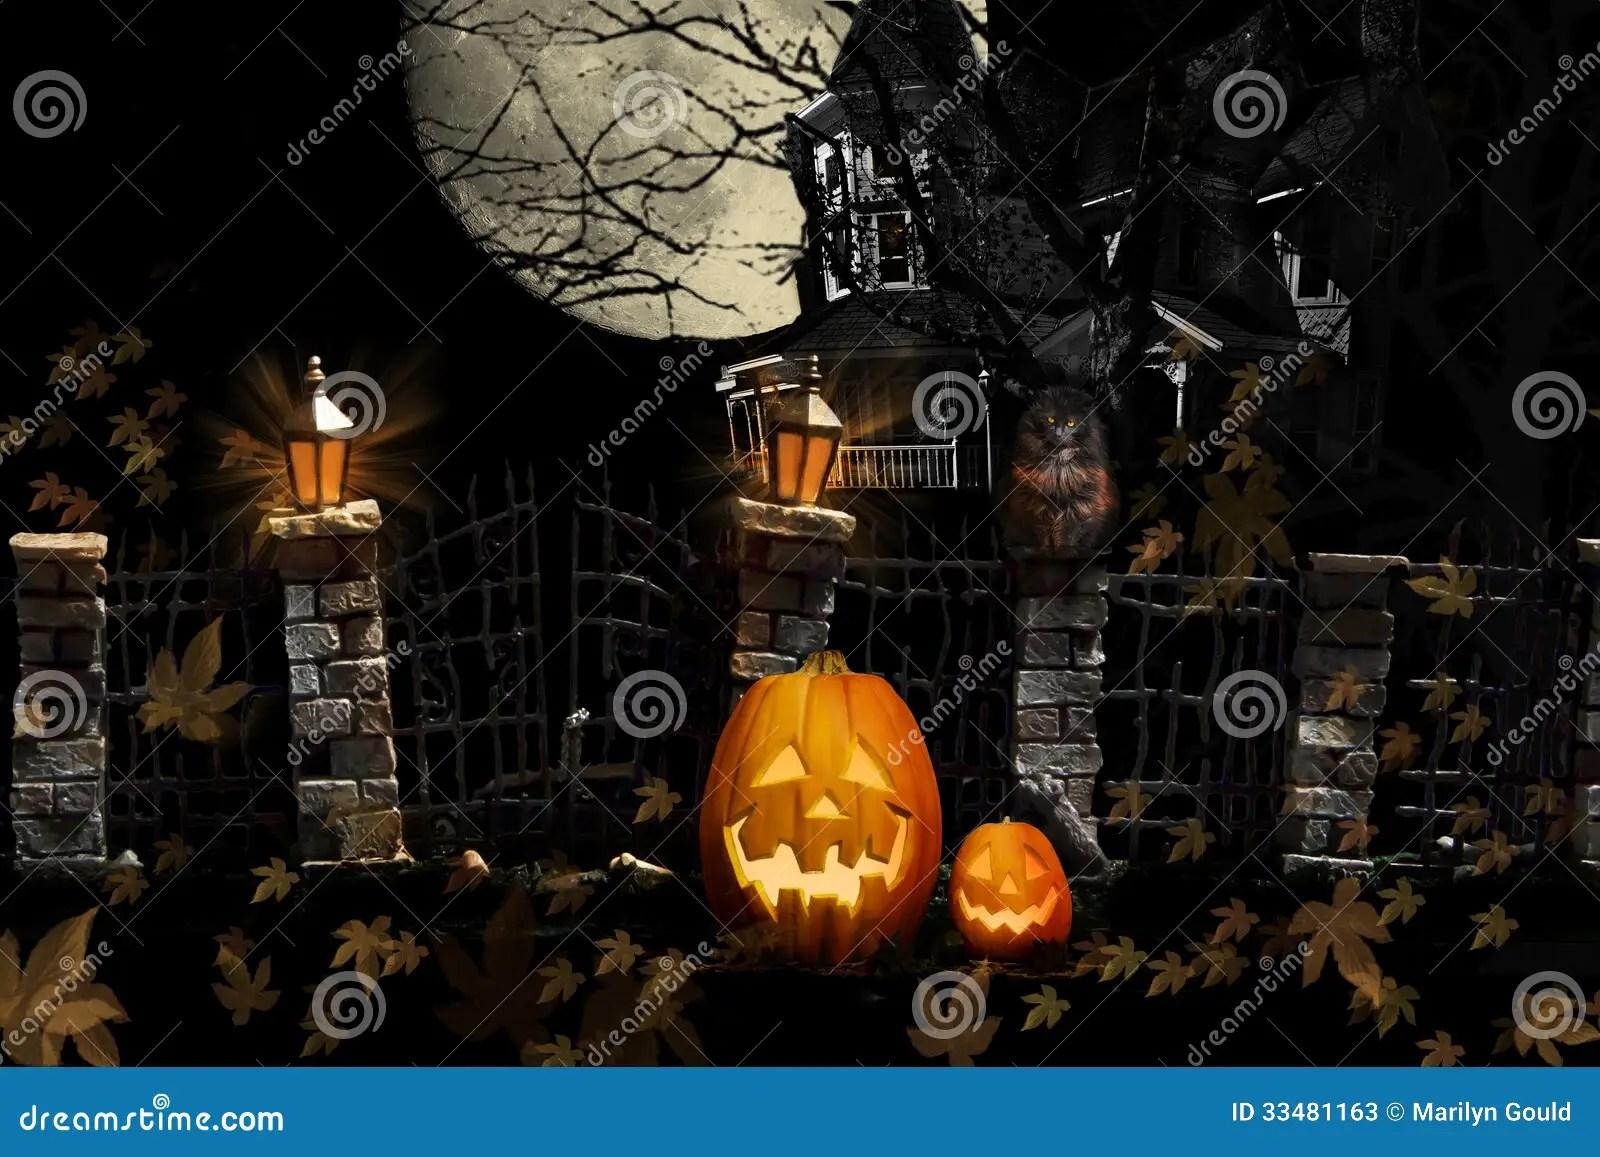 Fall Leaves Dancing Wallpaper Halloween Cat Pumpkins Haunted House Stock Image Image